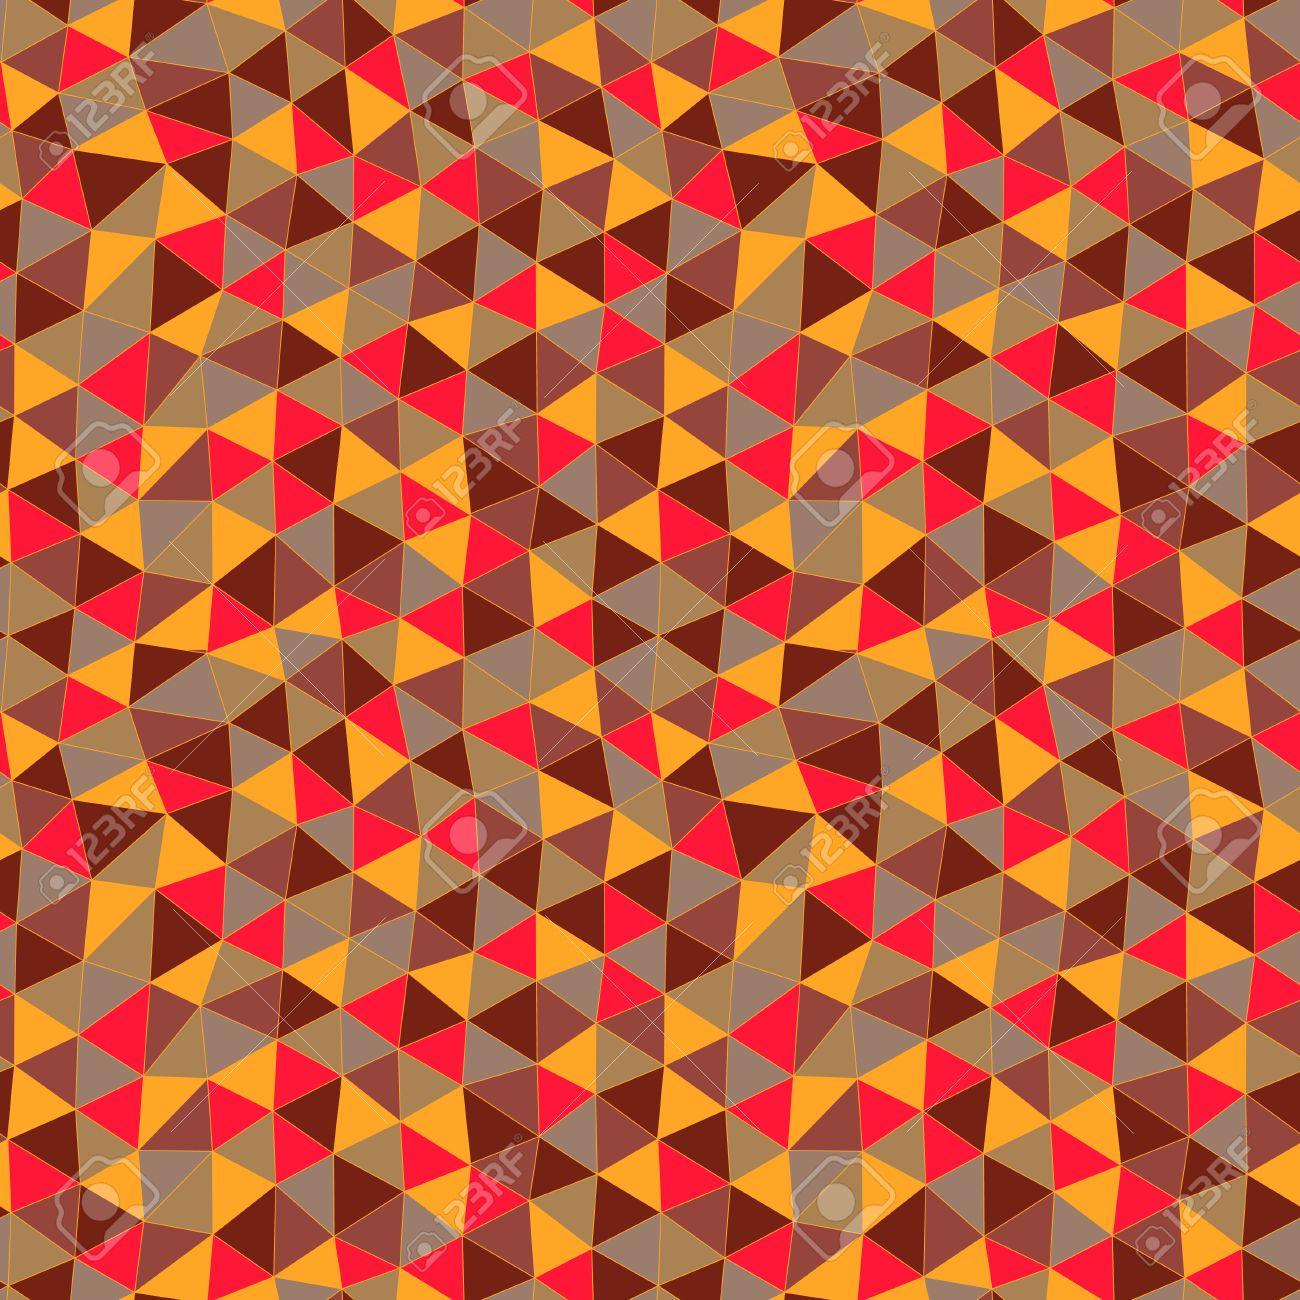 color, colorful, pattern, fashion, shape, background, backdrop